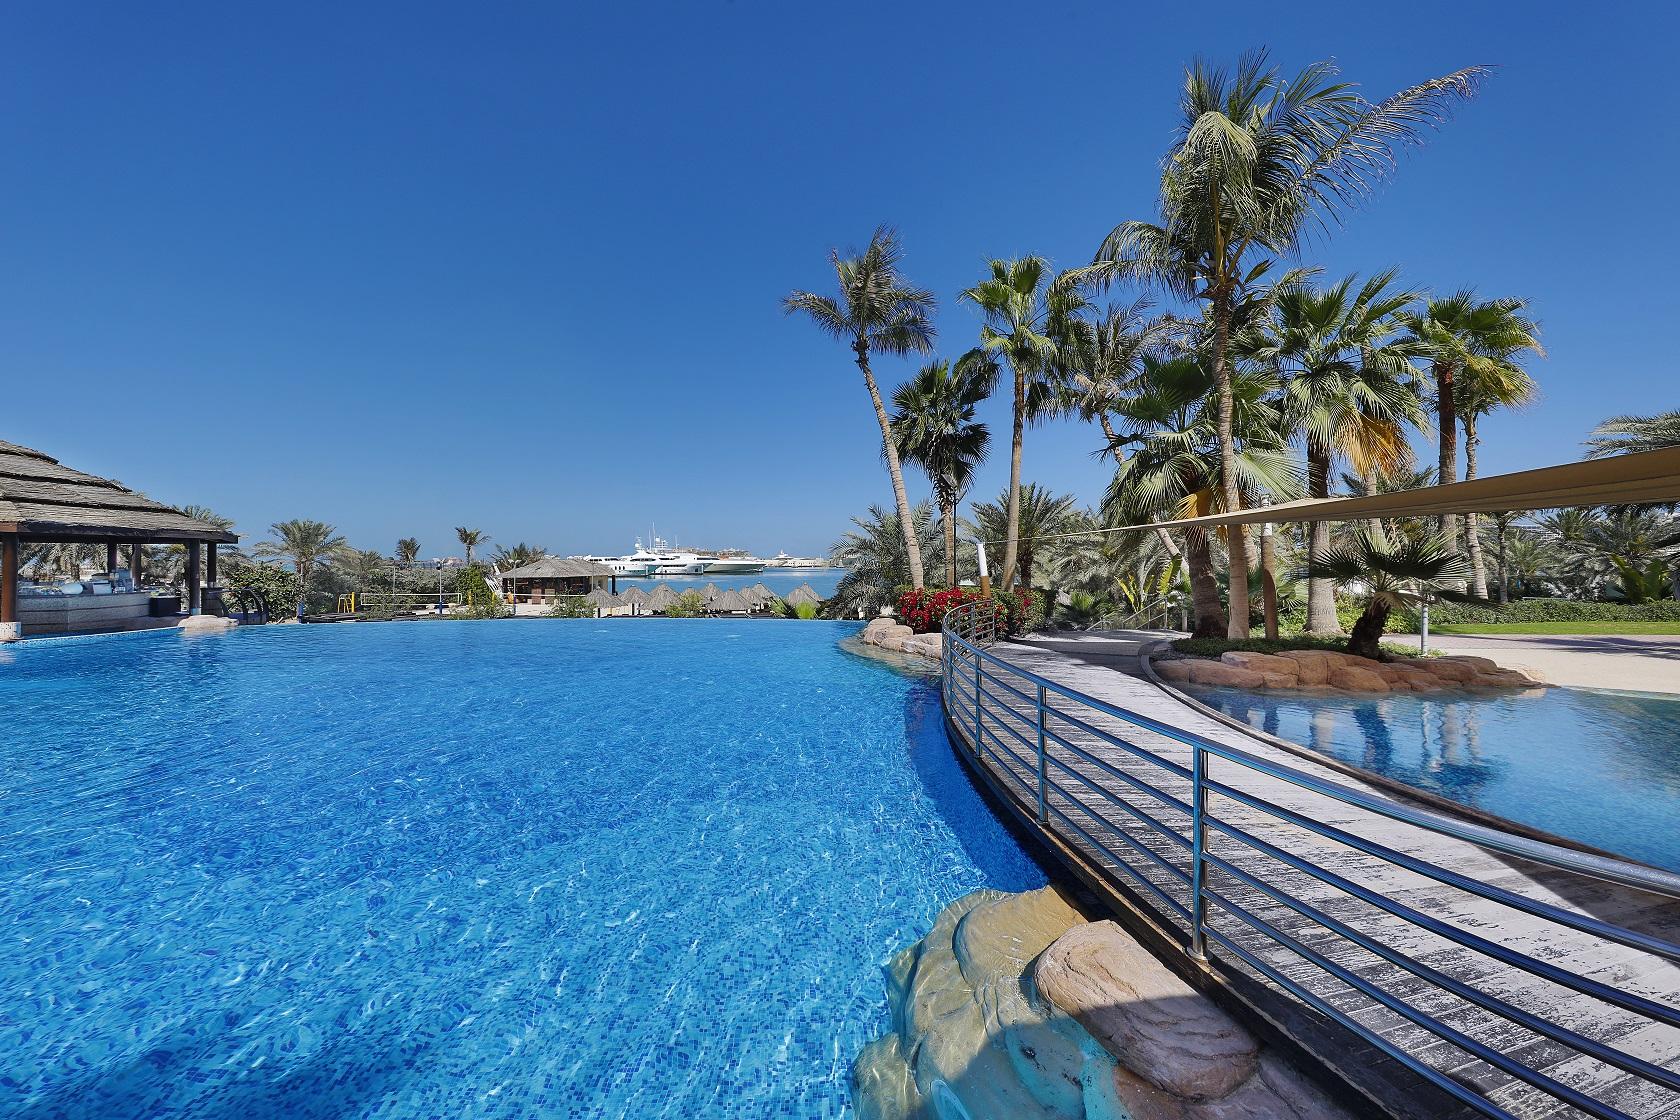 Le Meridien Mina Seyahi black friday hotel deals